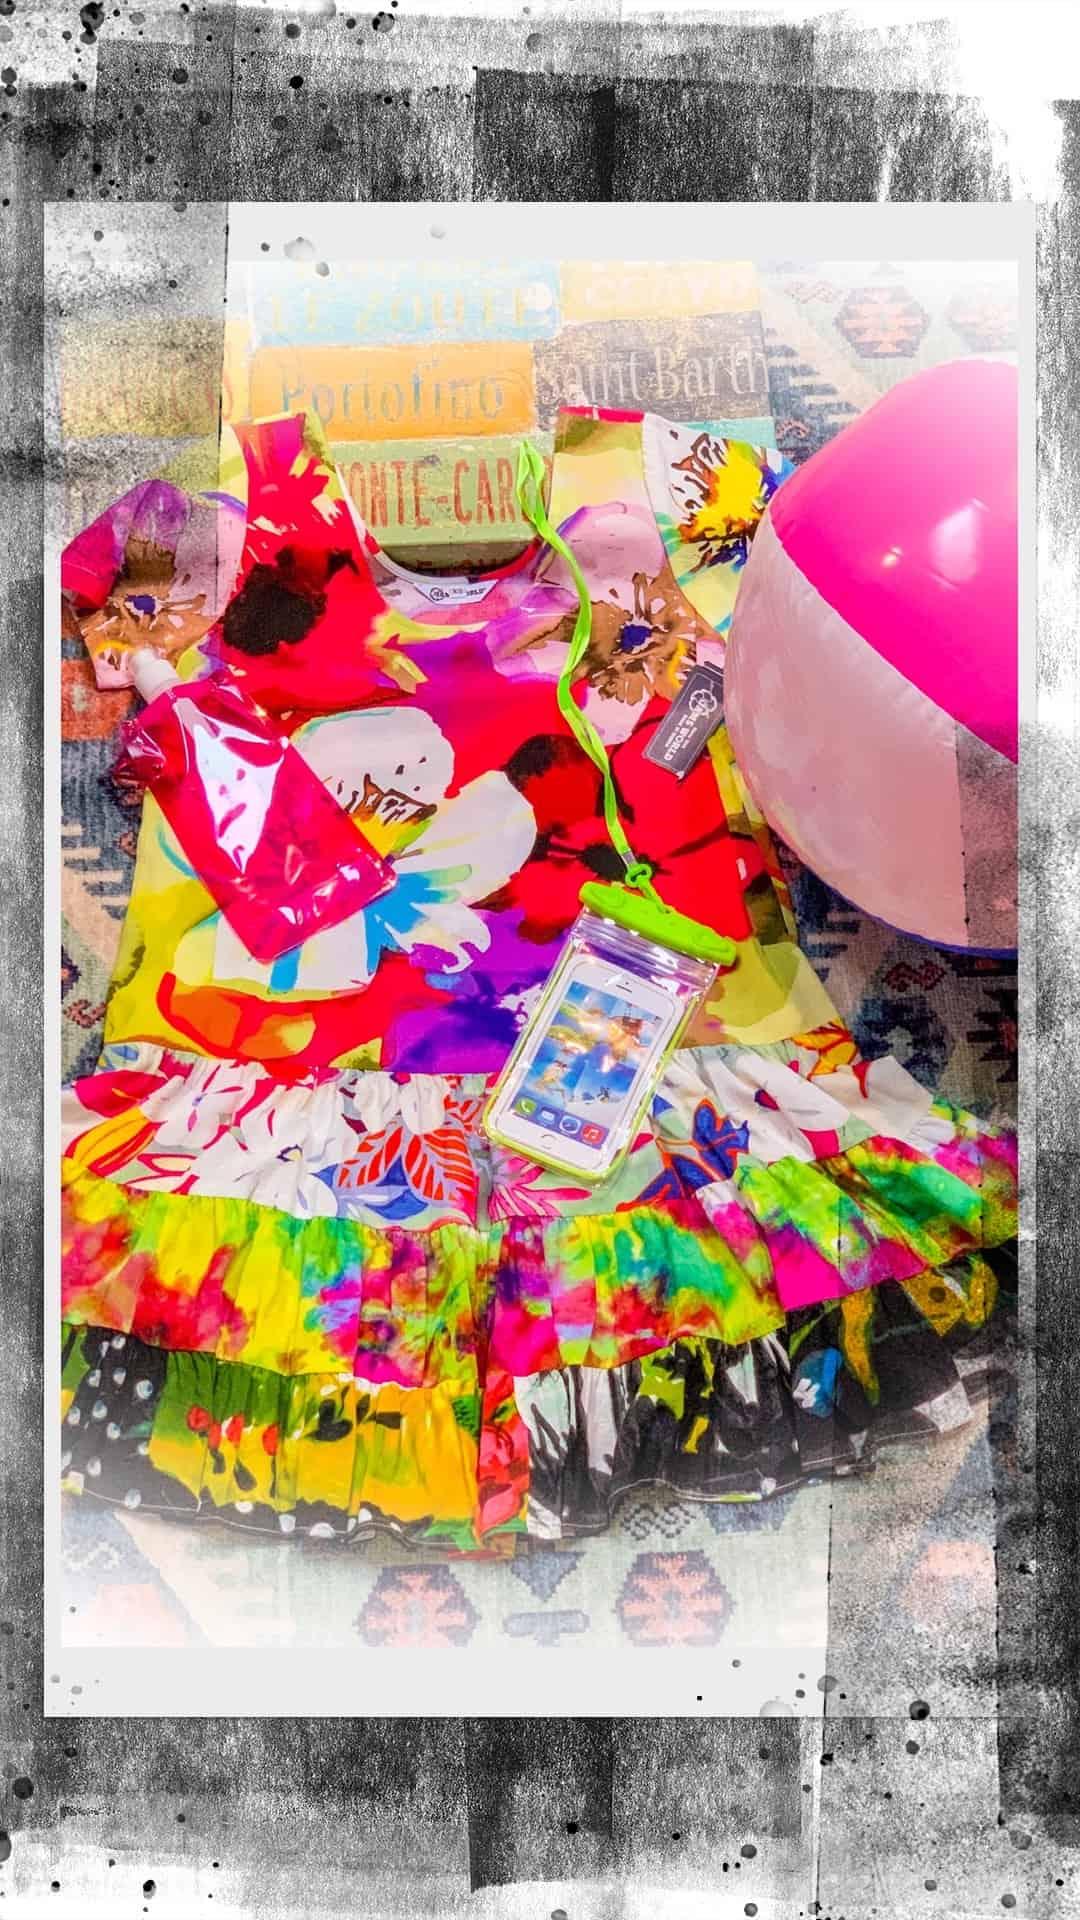 Shaunda Necole x Jams World- color is my favorite